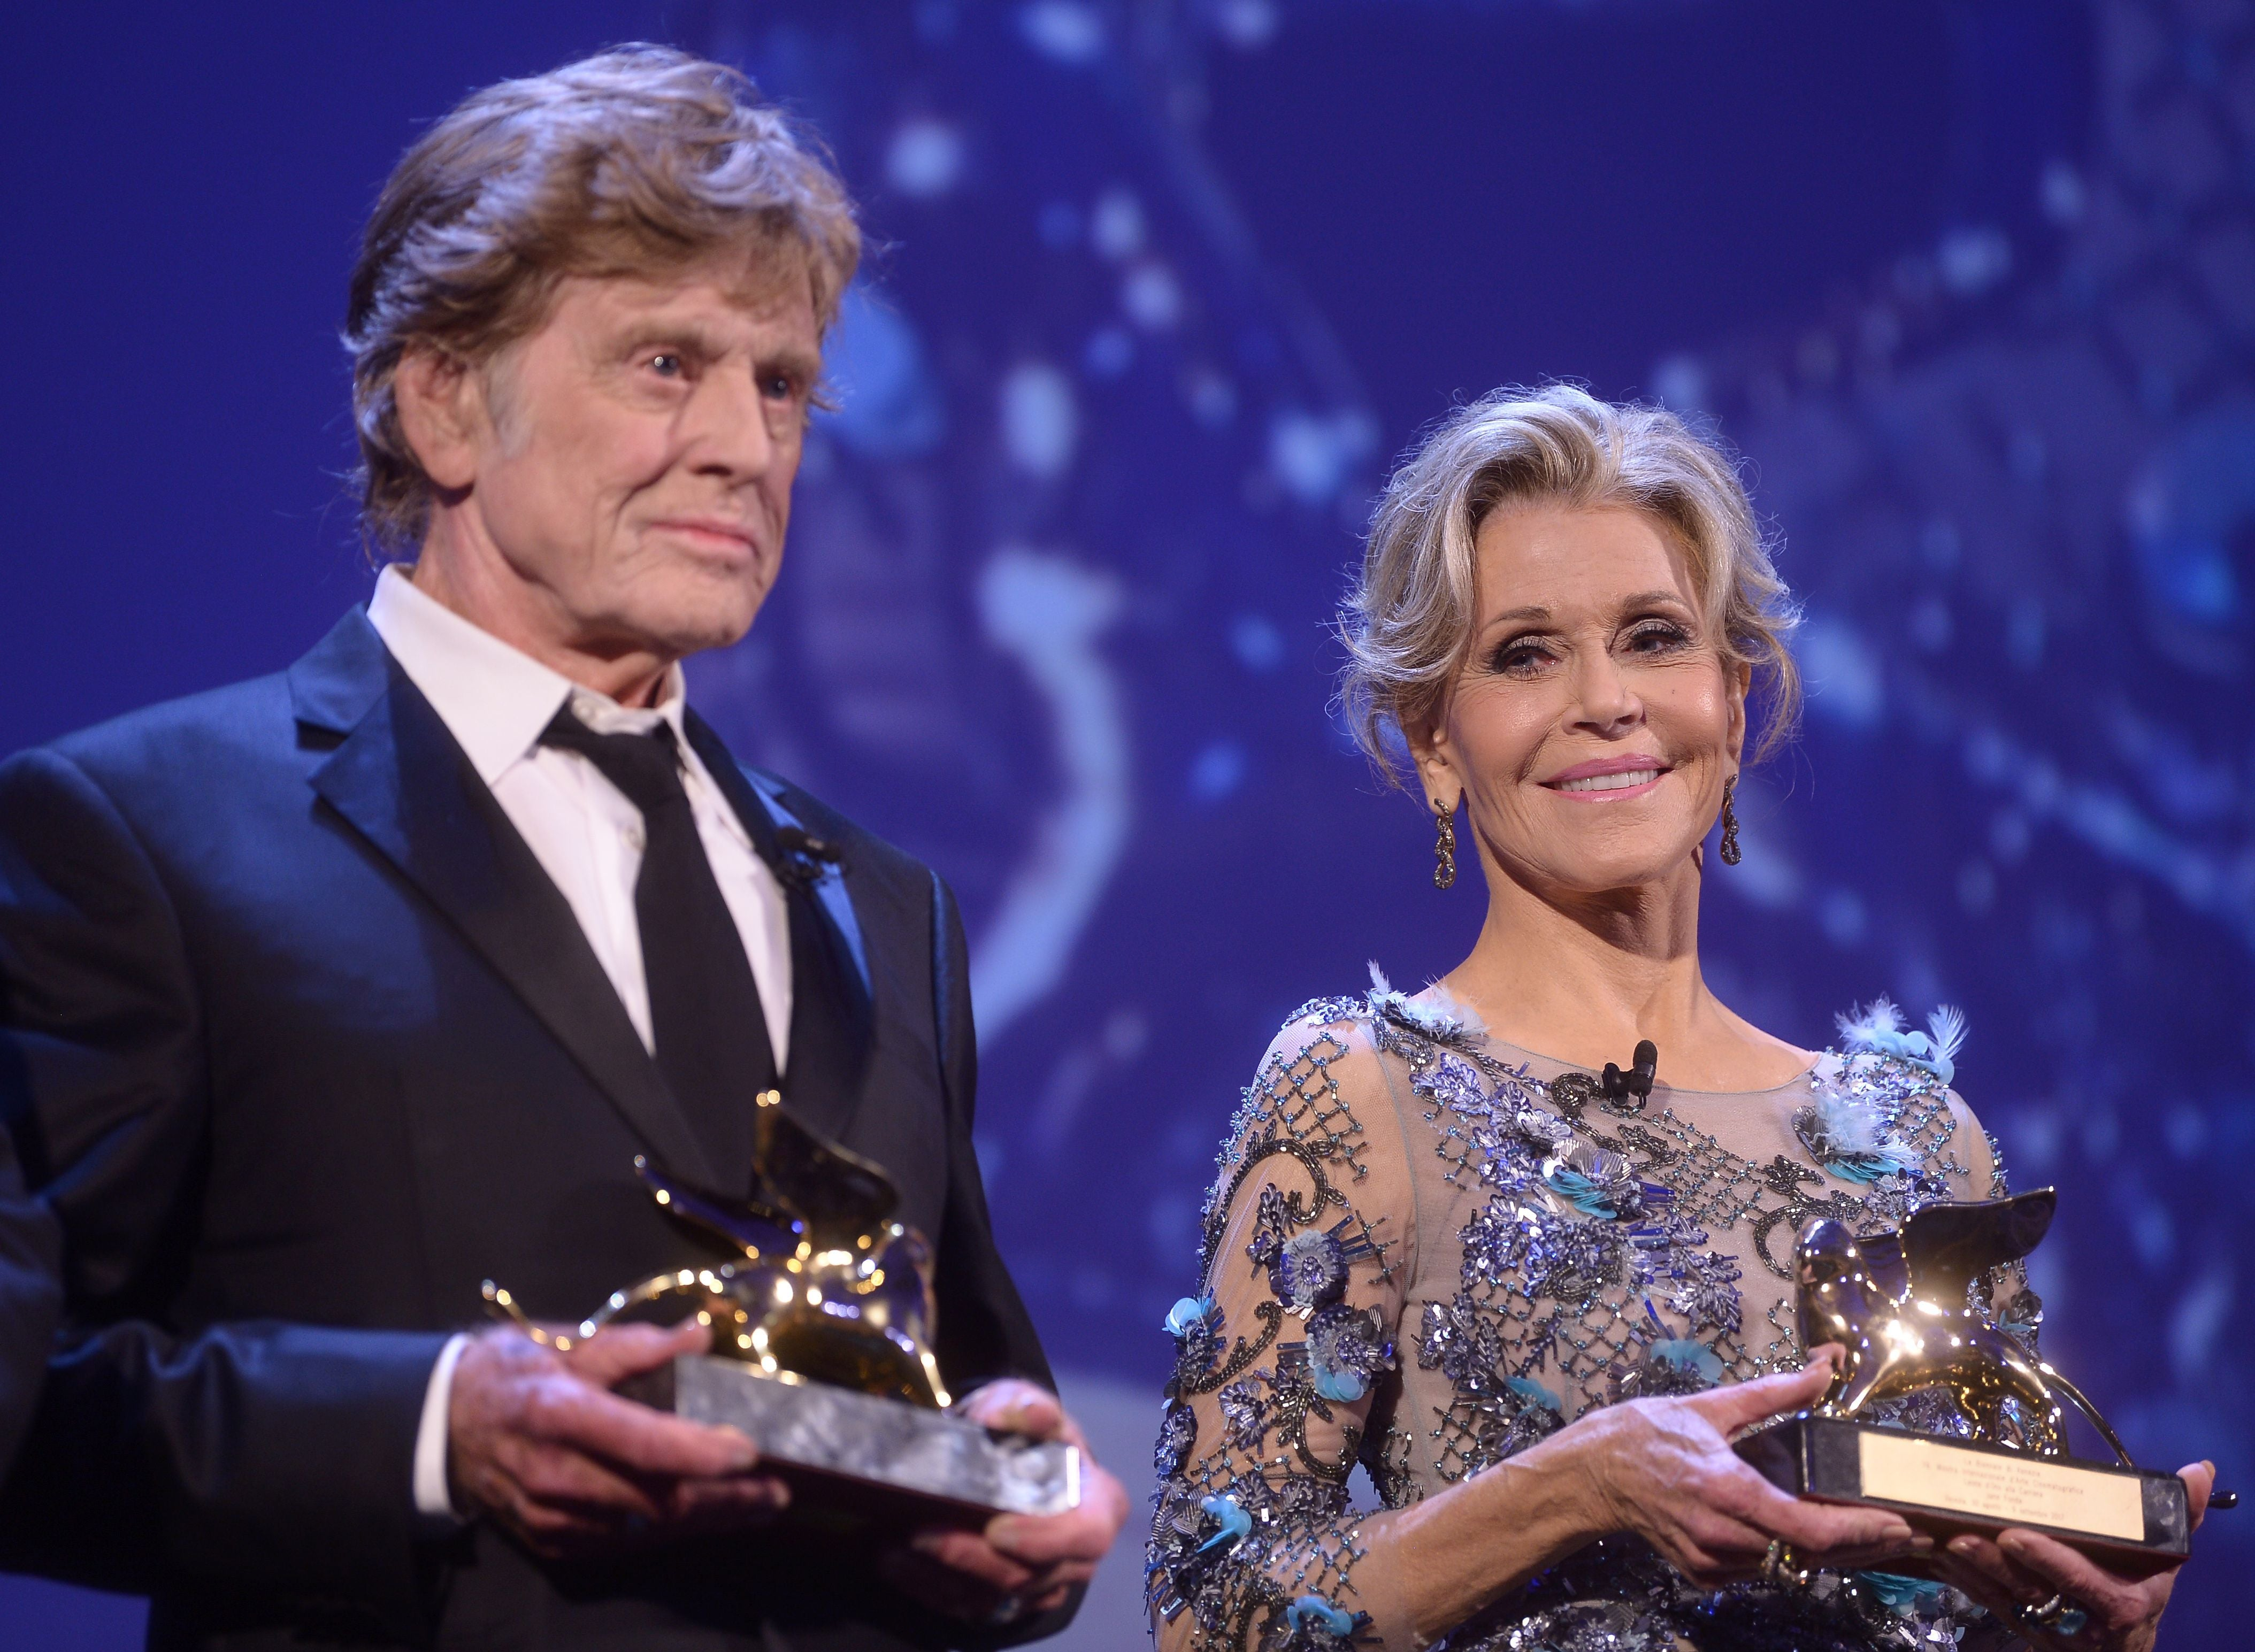 Robert Redford and Jane Fonda receive the Golden Lion Lifetime Achievement at the 74th Venice Film Festival